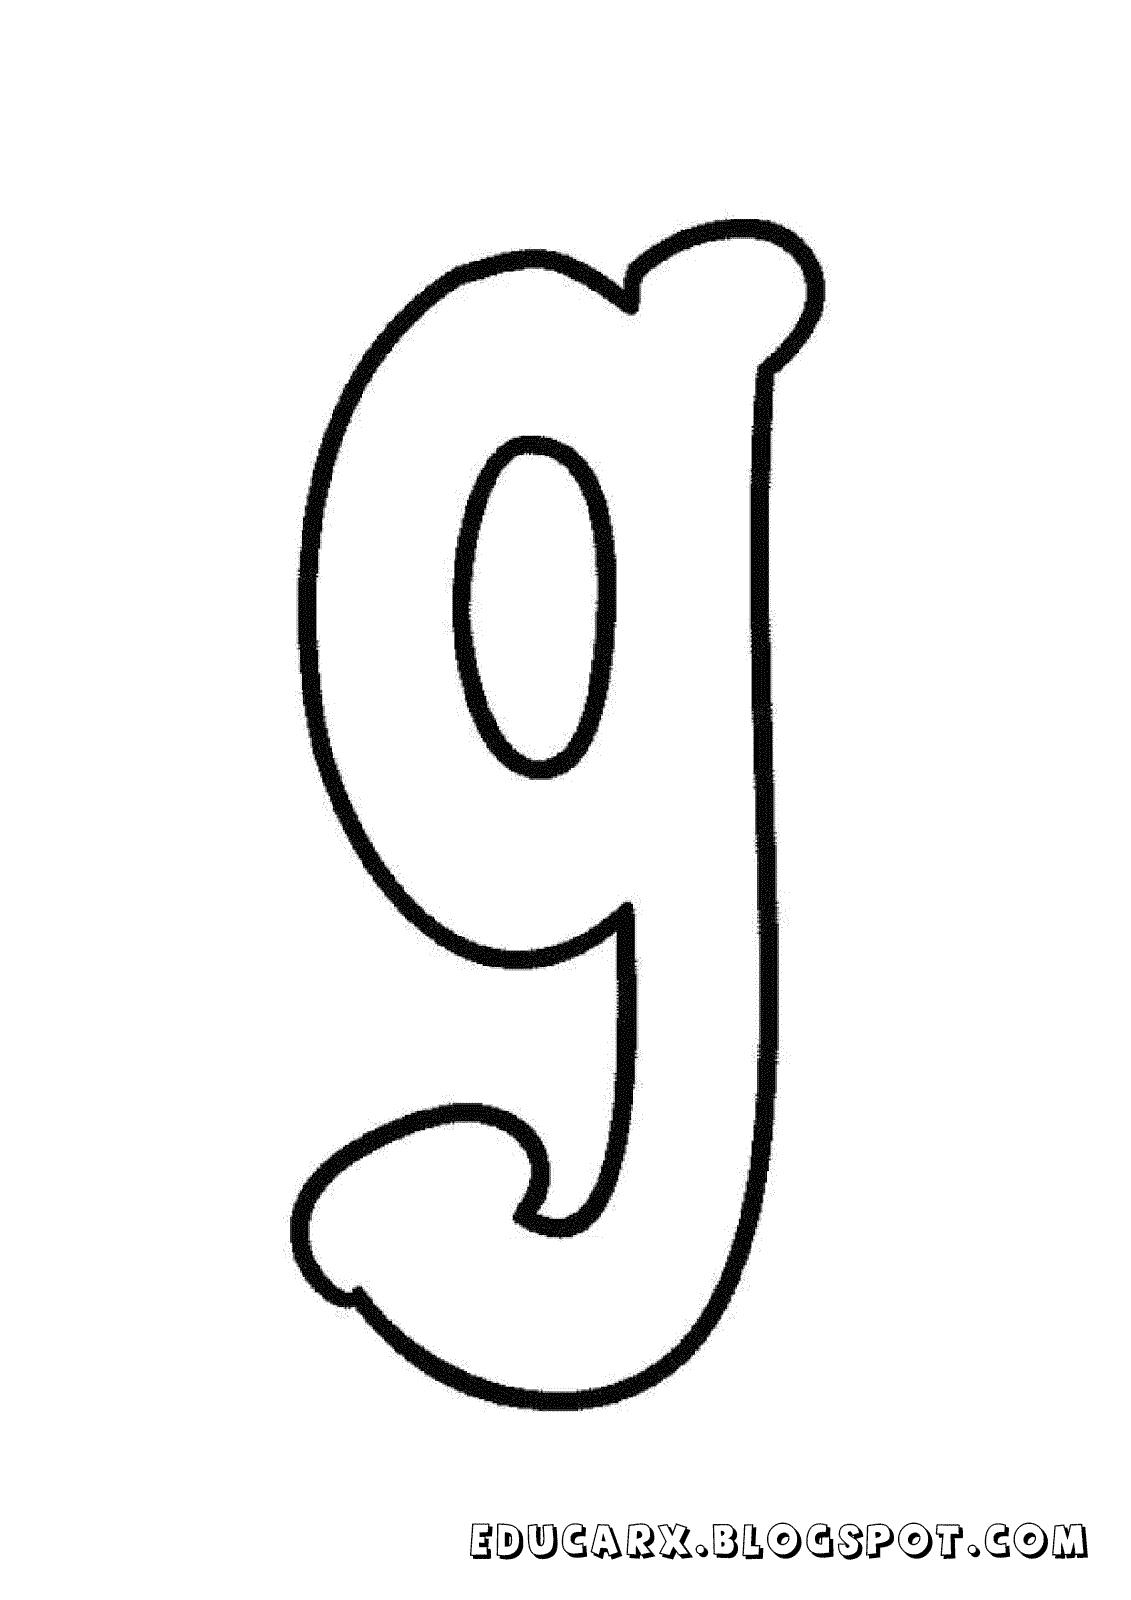 Letra G Moldes De Letra G Moldes Modells Leters Letras